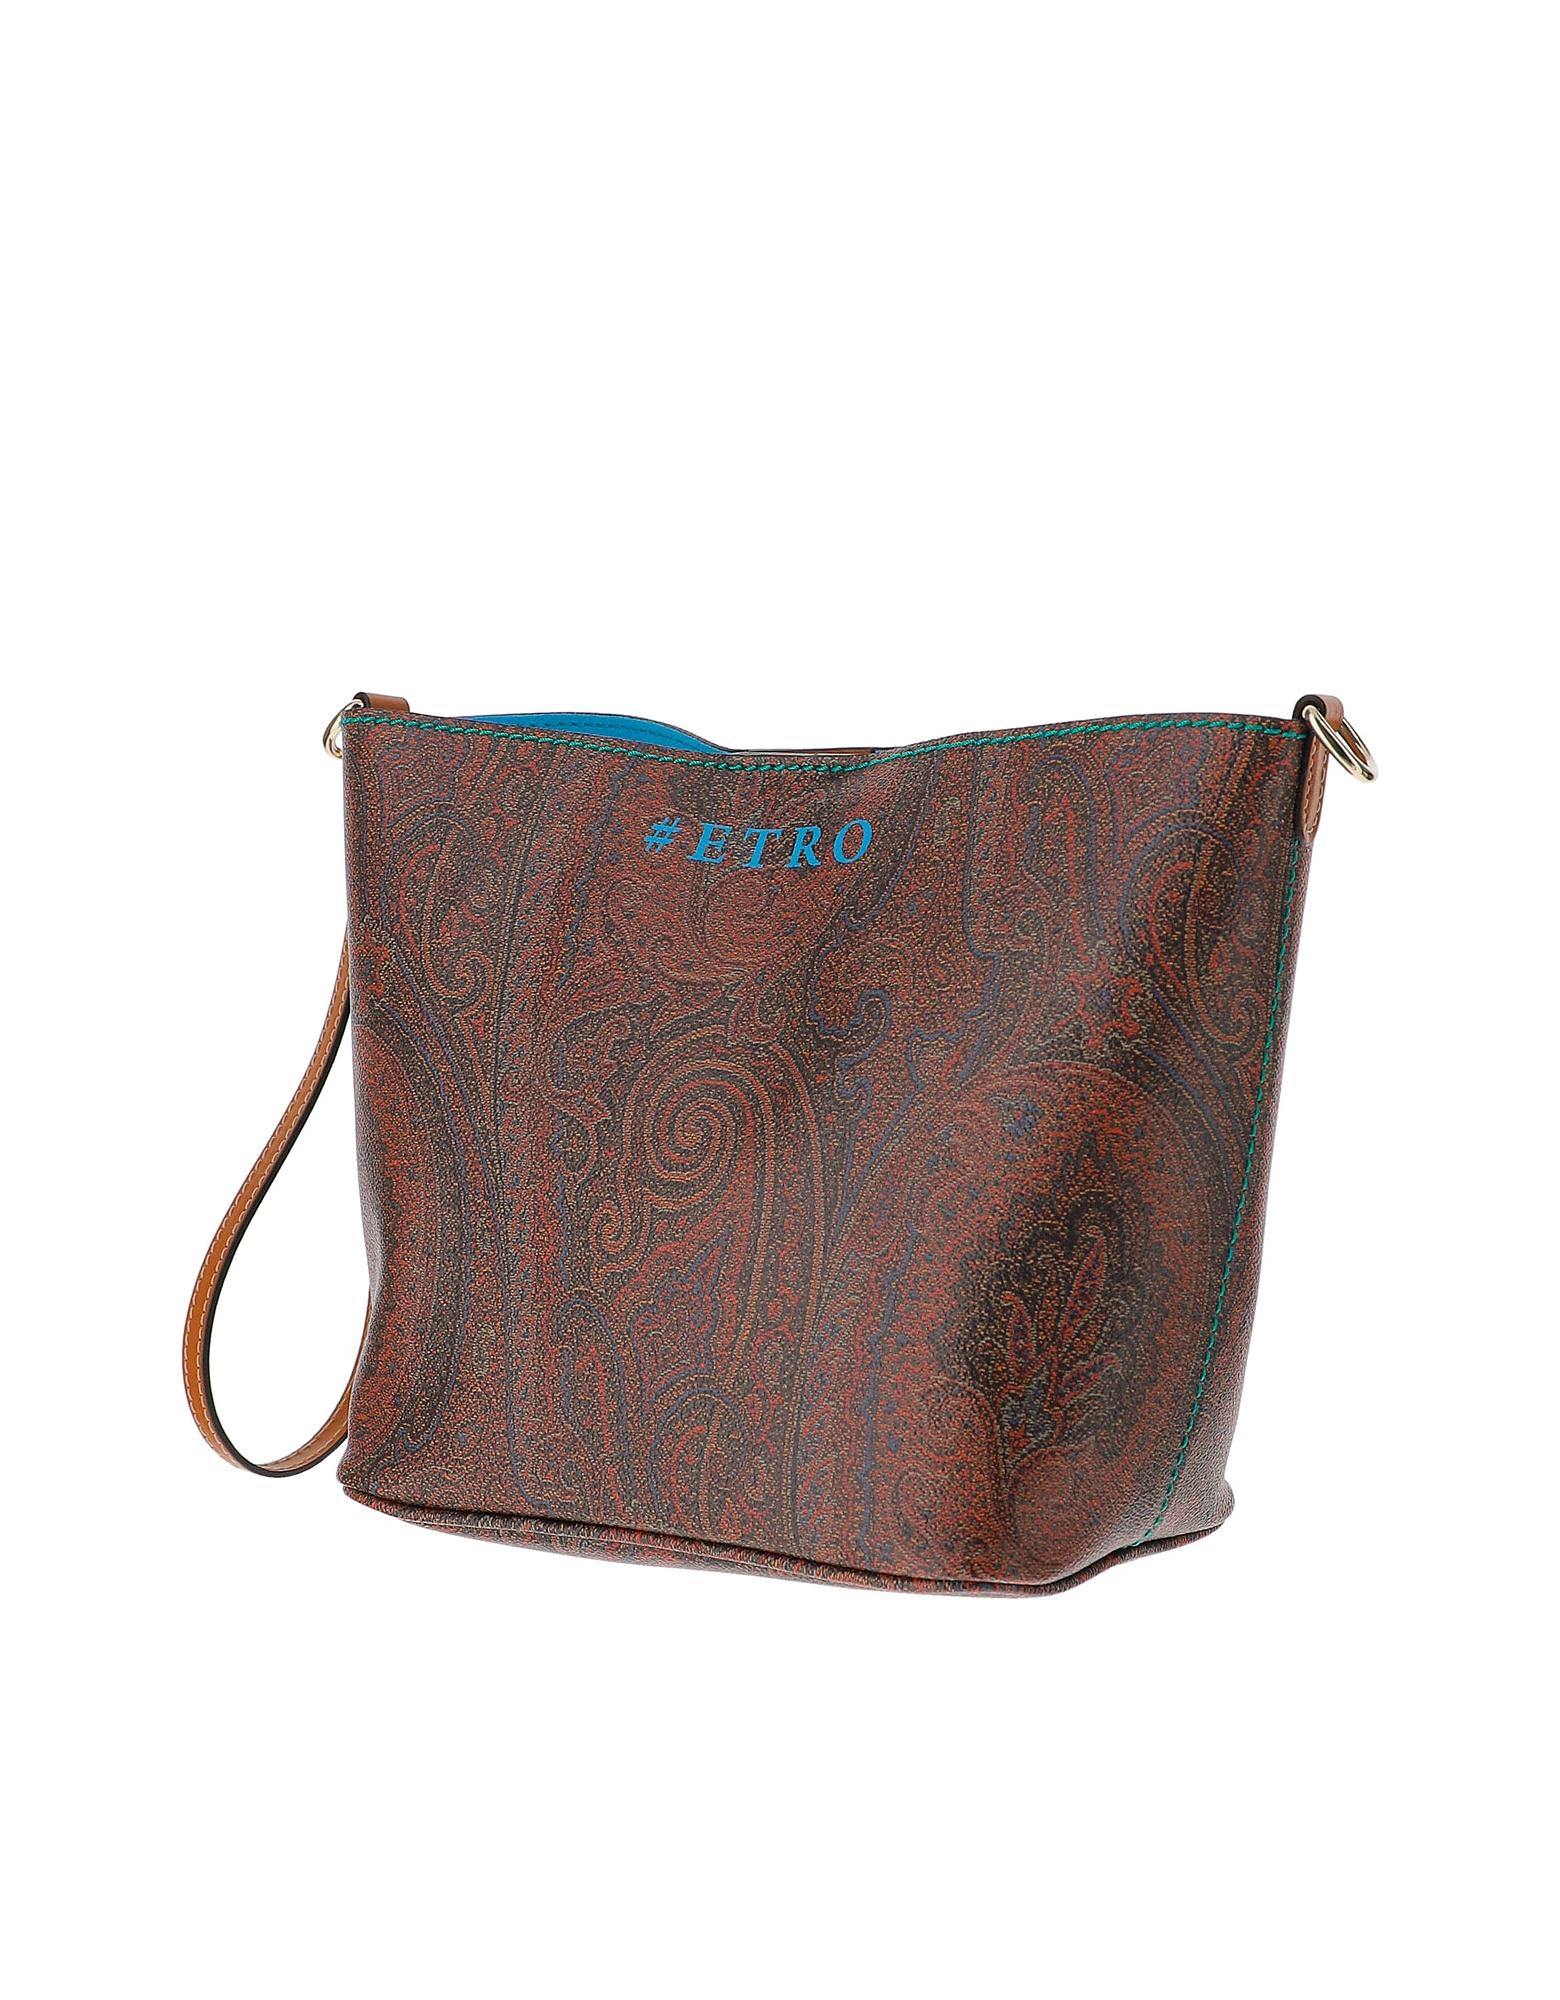 Etro Designer Handbags, Paisley Jacquard Canvas Shoulder Bag